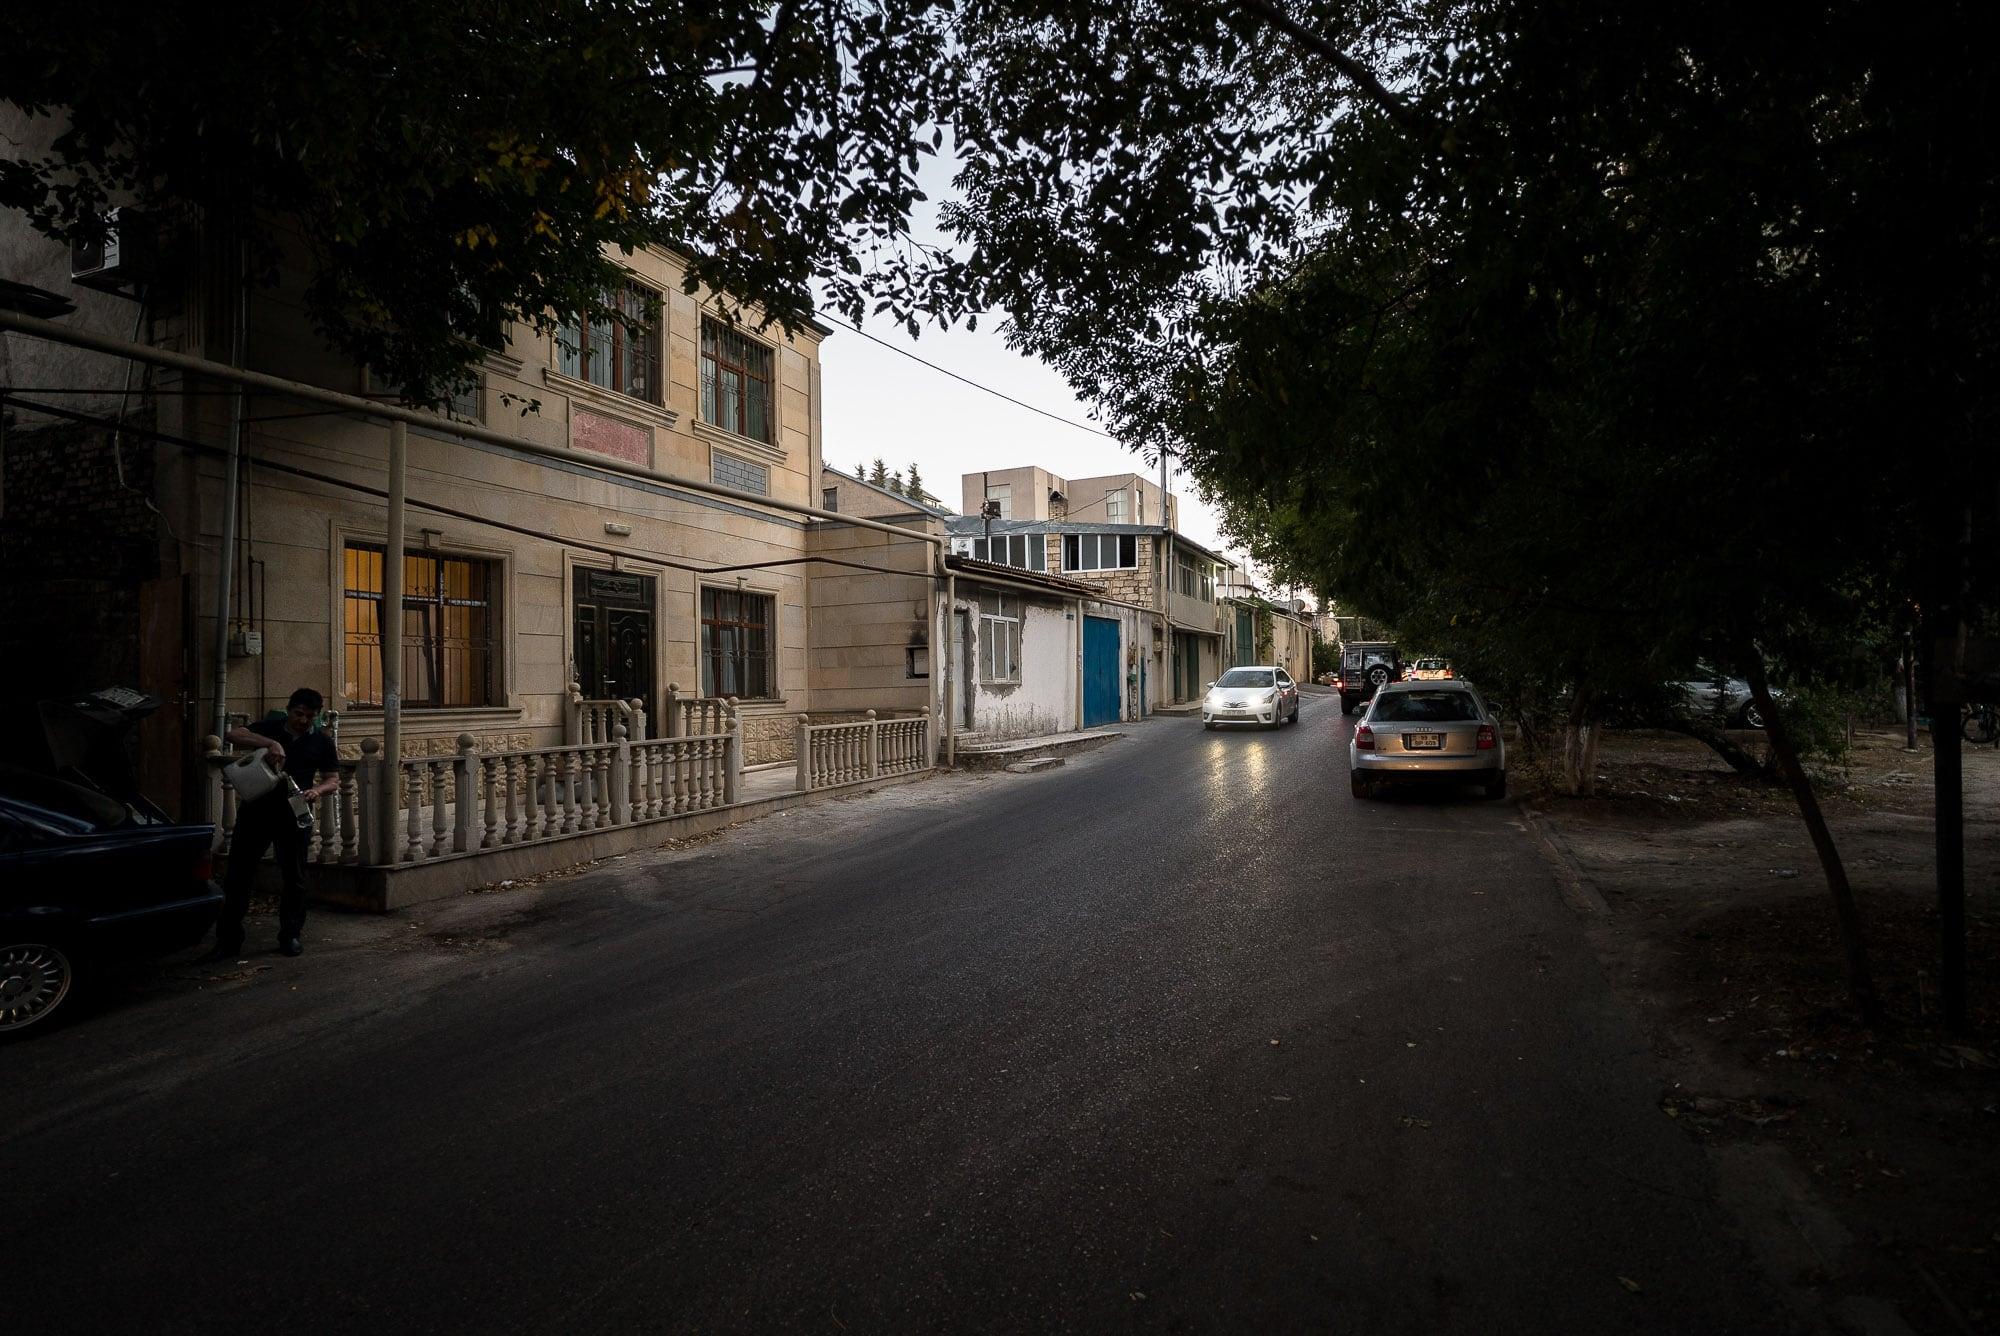 evening in Baku